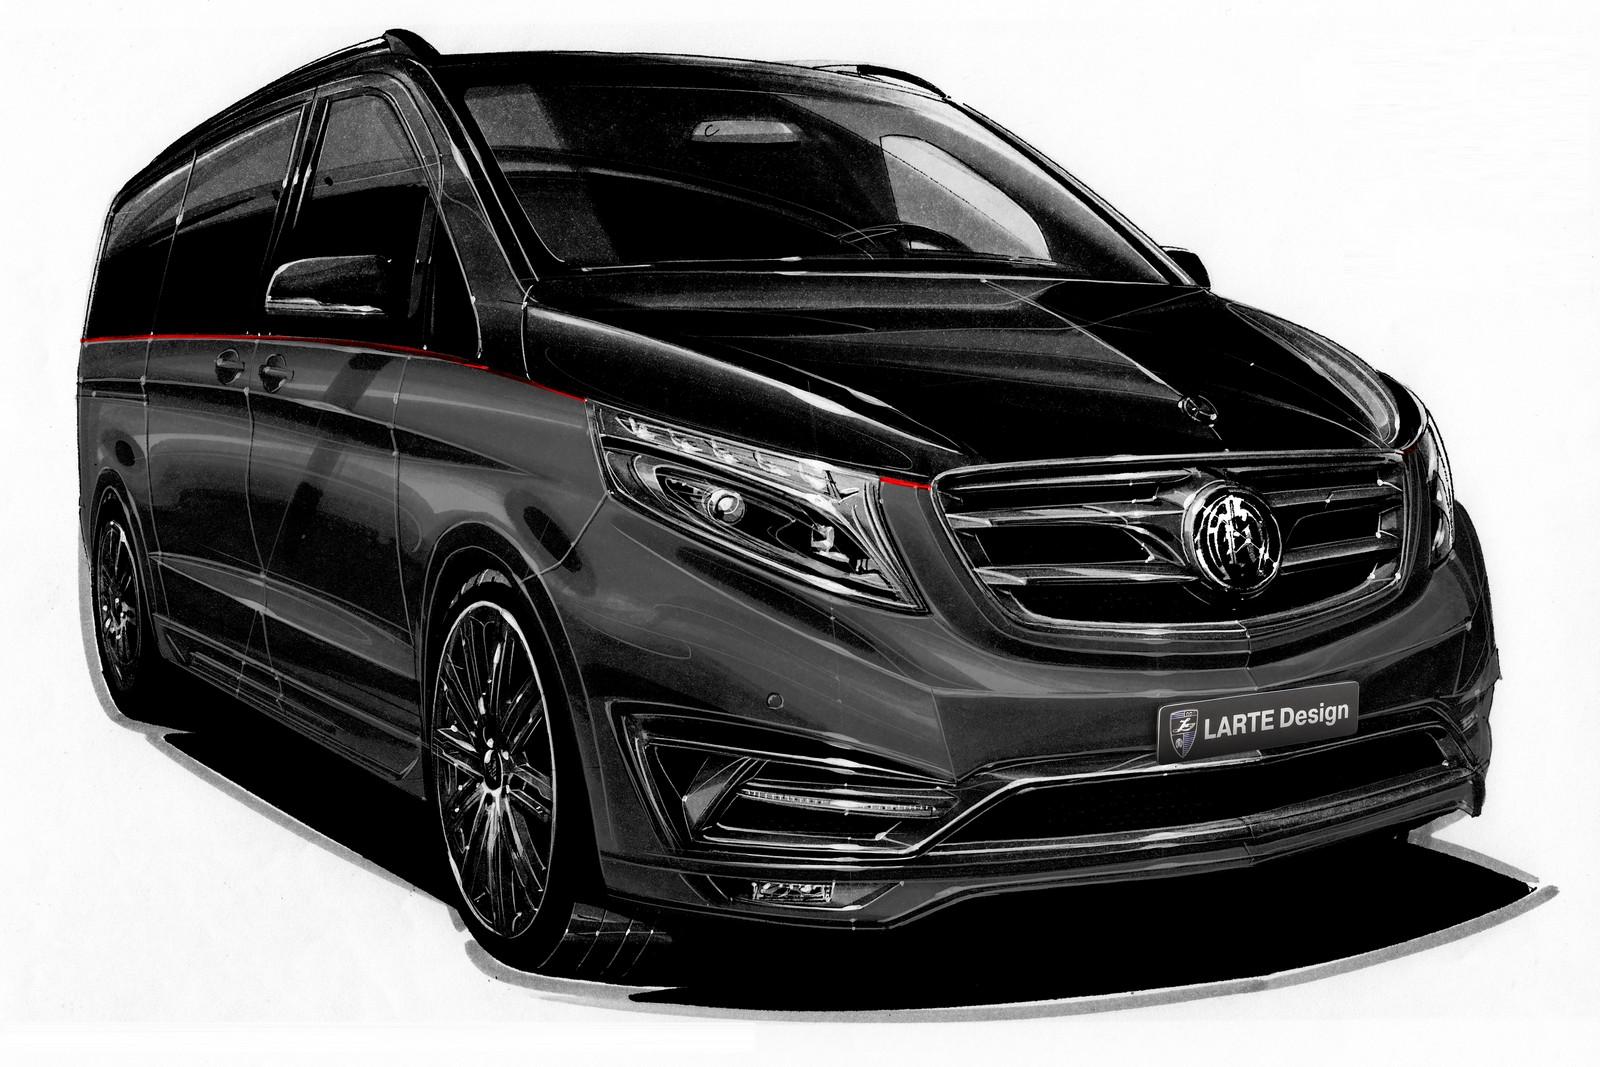 Mercedes v class gets full treatment from carlex design - Larte Design Unveils Mercedes V Class Black Crystal For Geneva